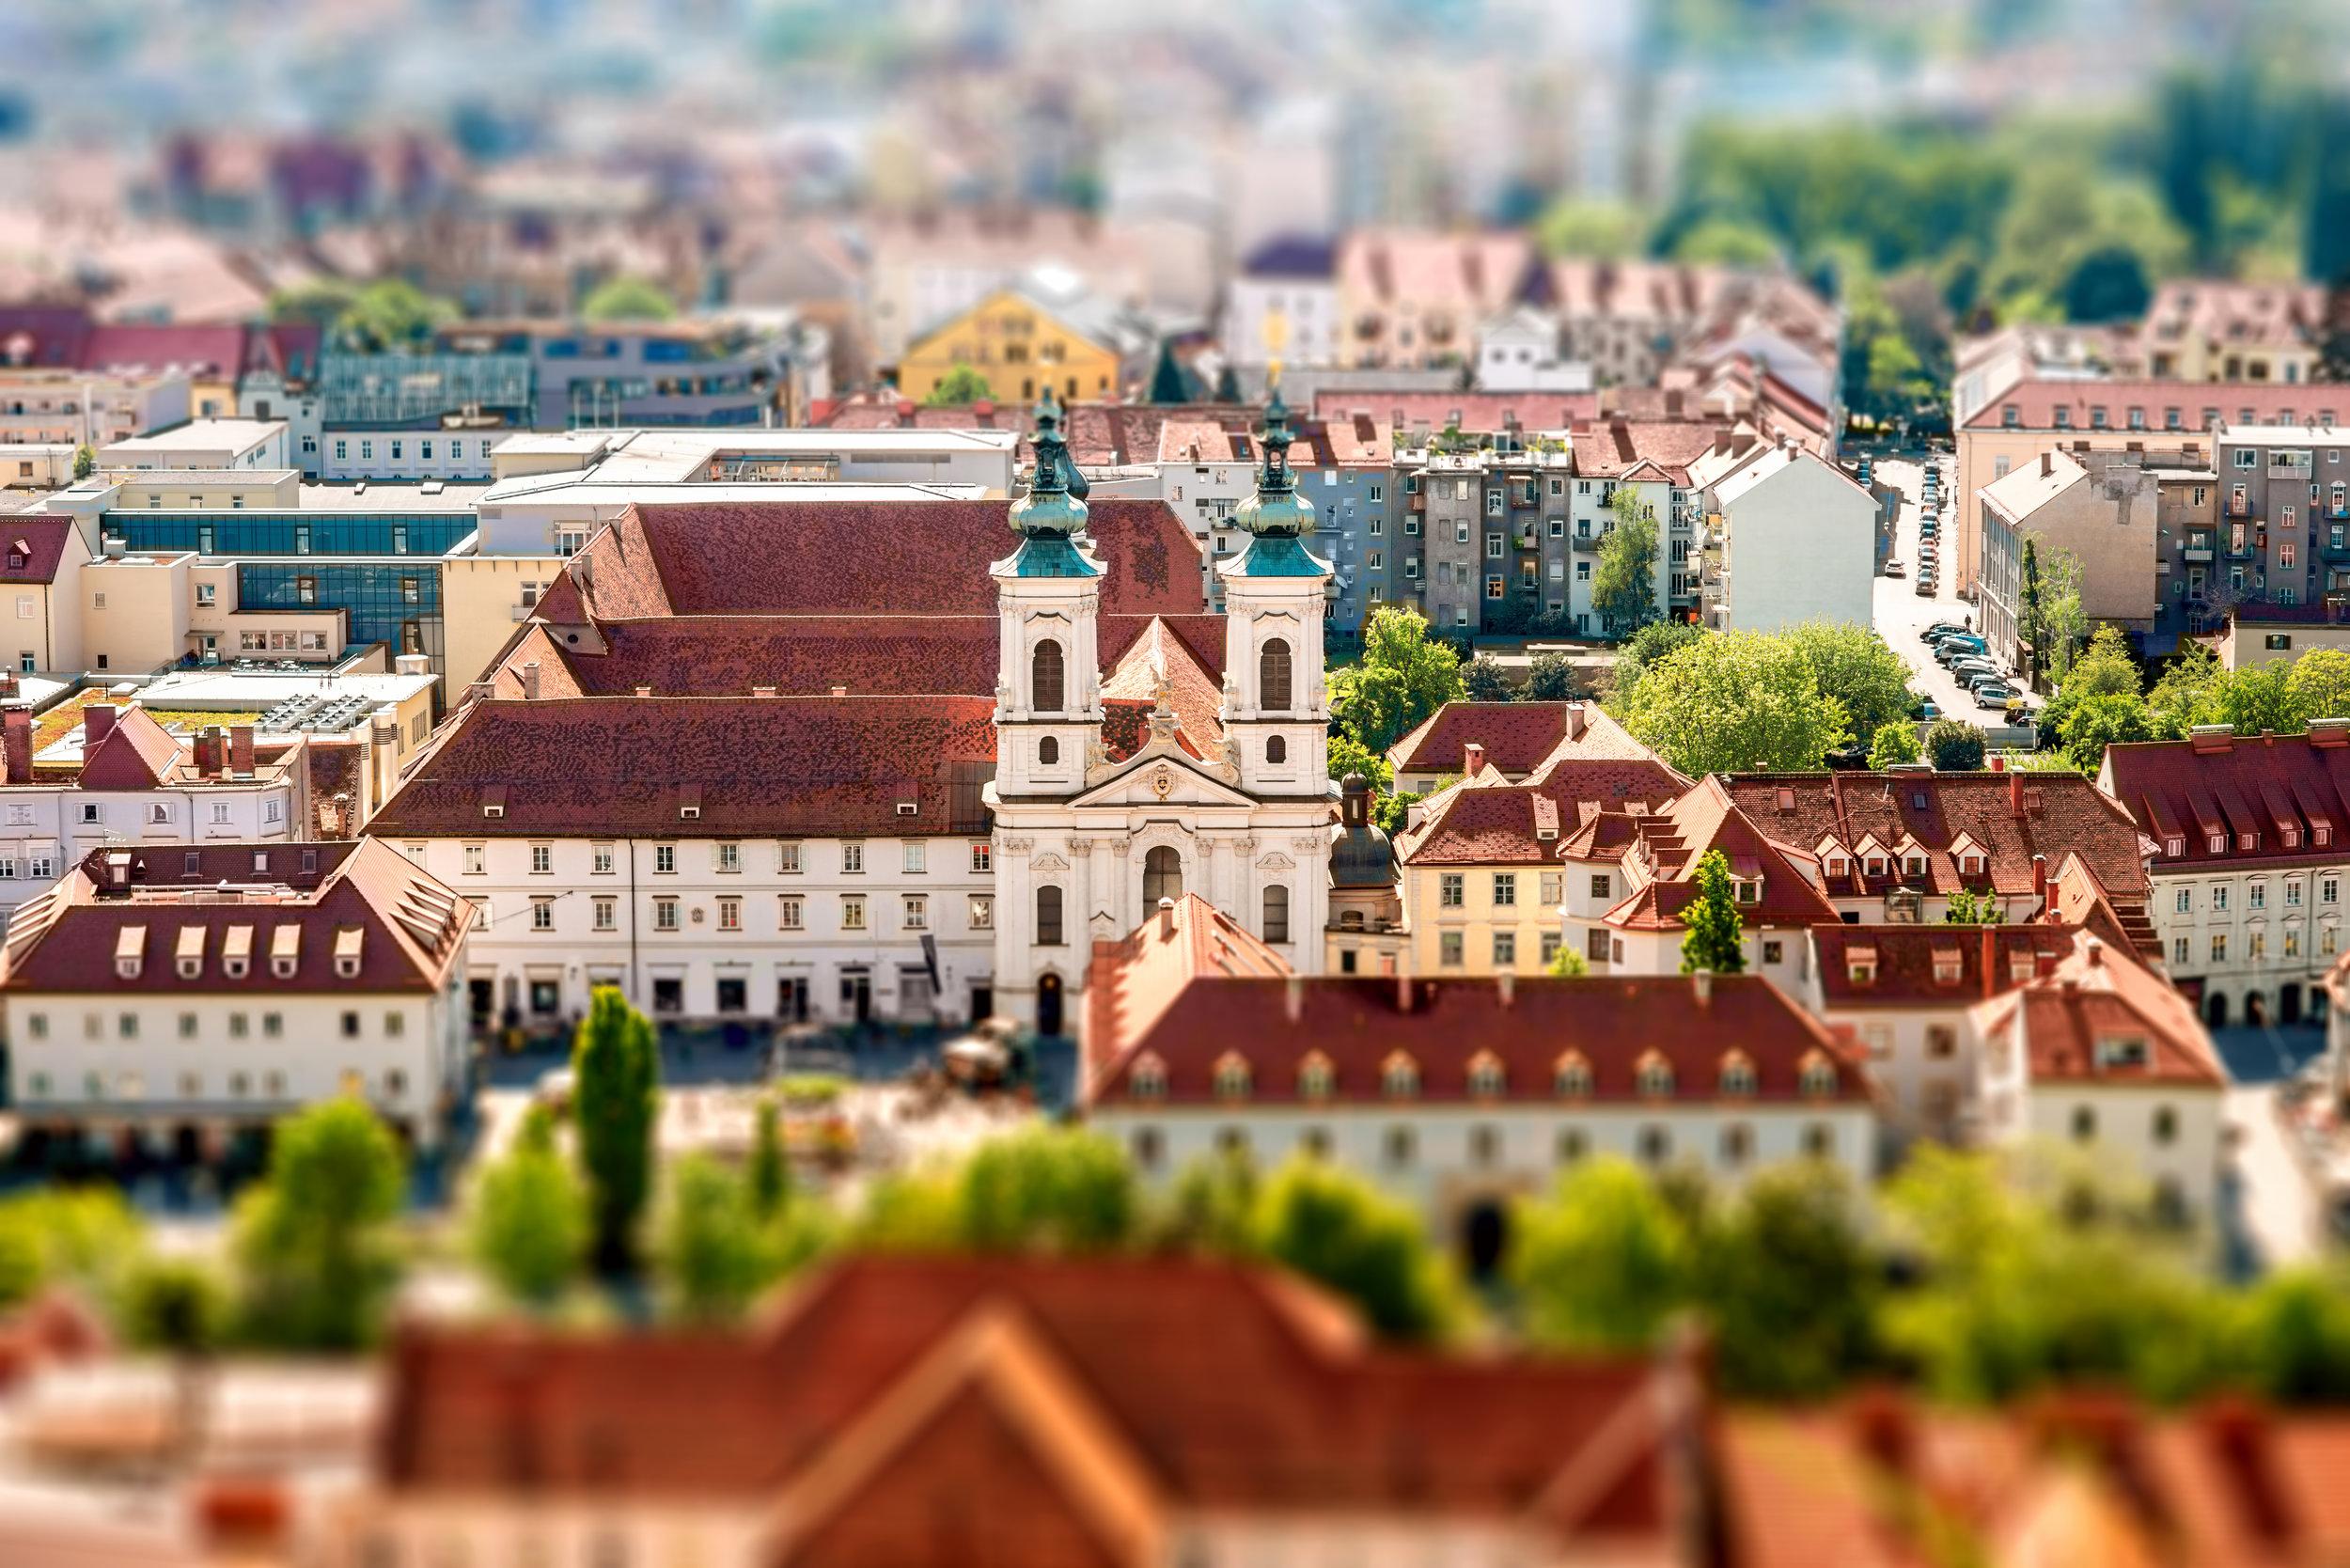 Aerial view on Graz city in Austria. Tilt-shift image technic